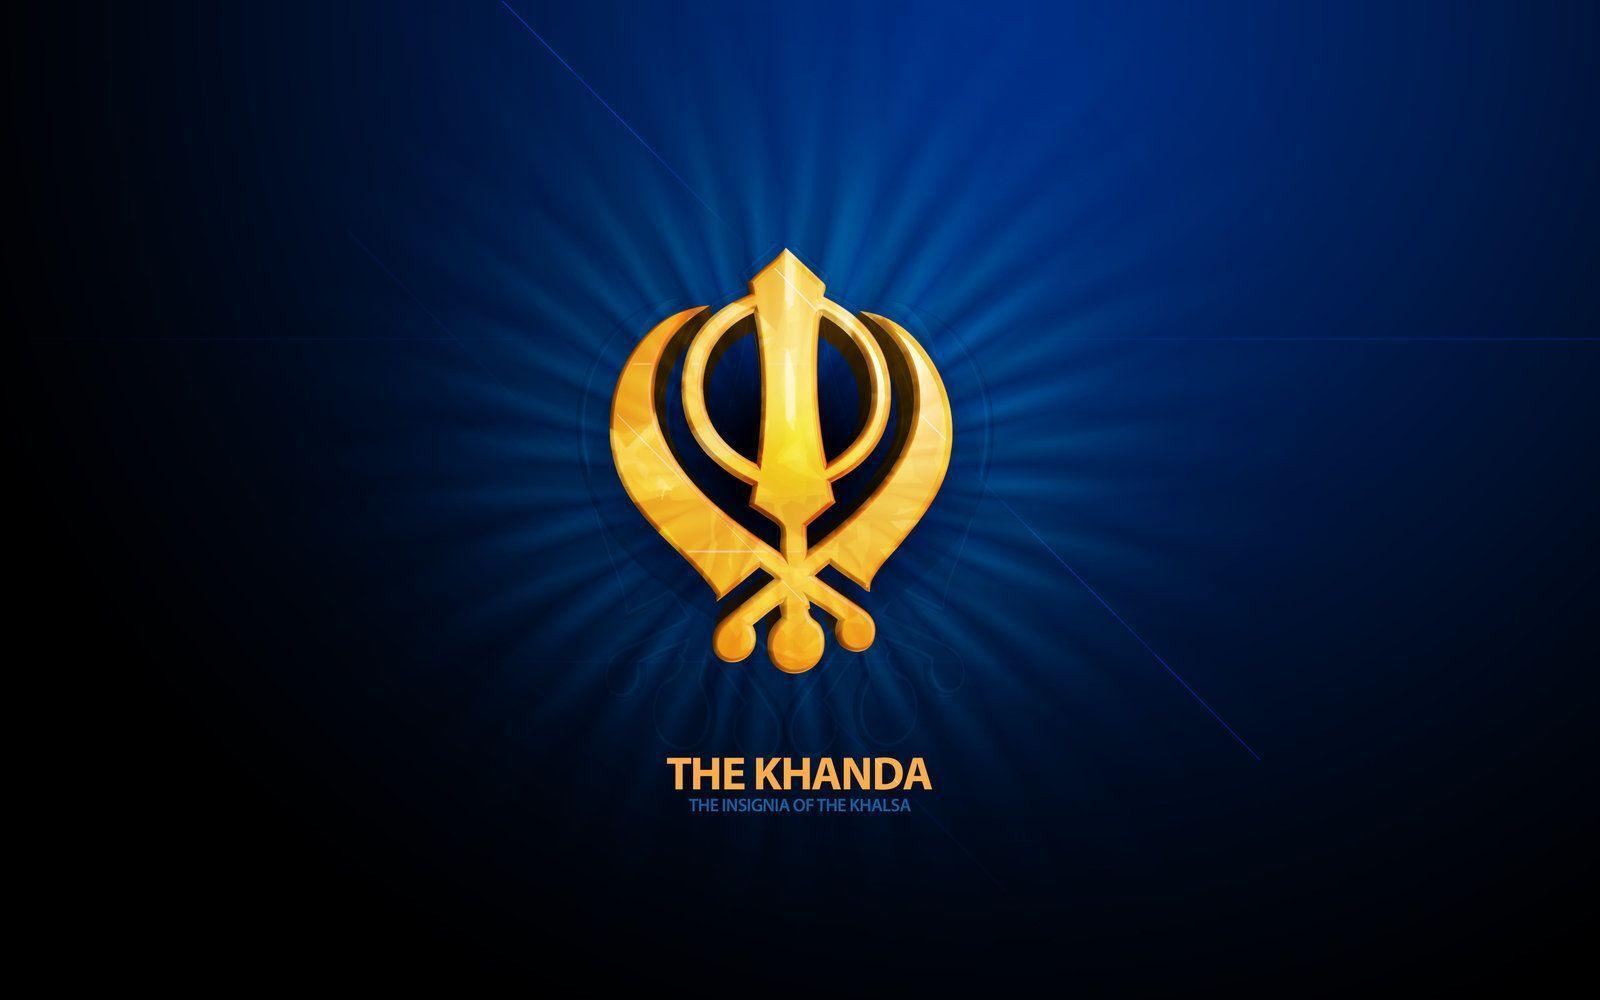 Khanda wallpaper